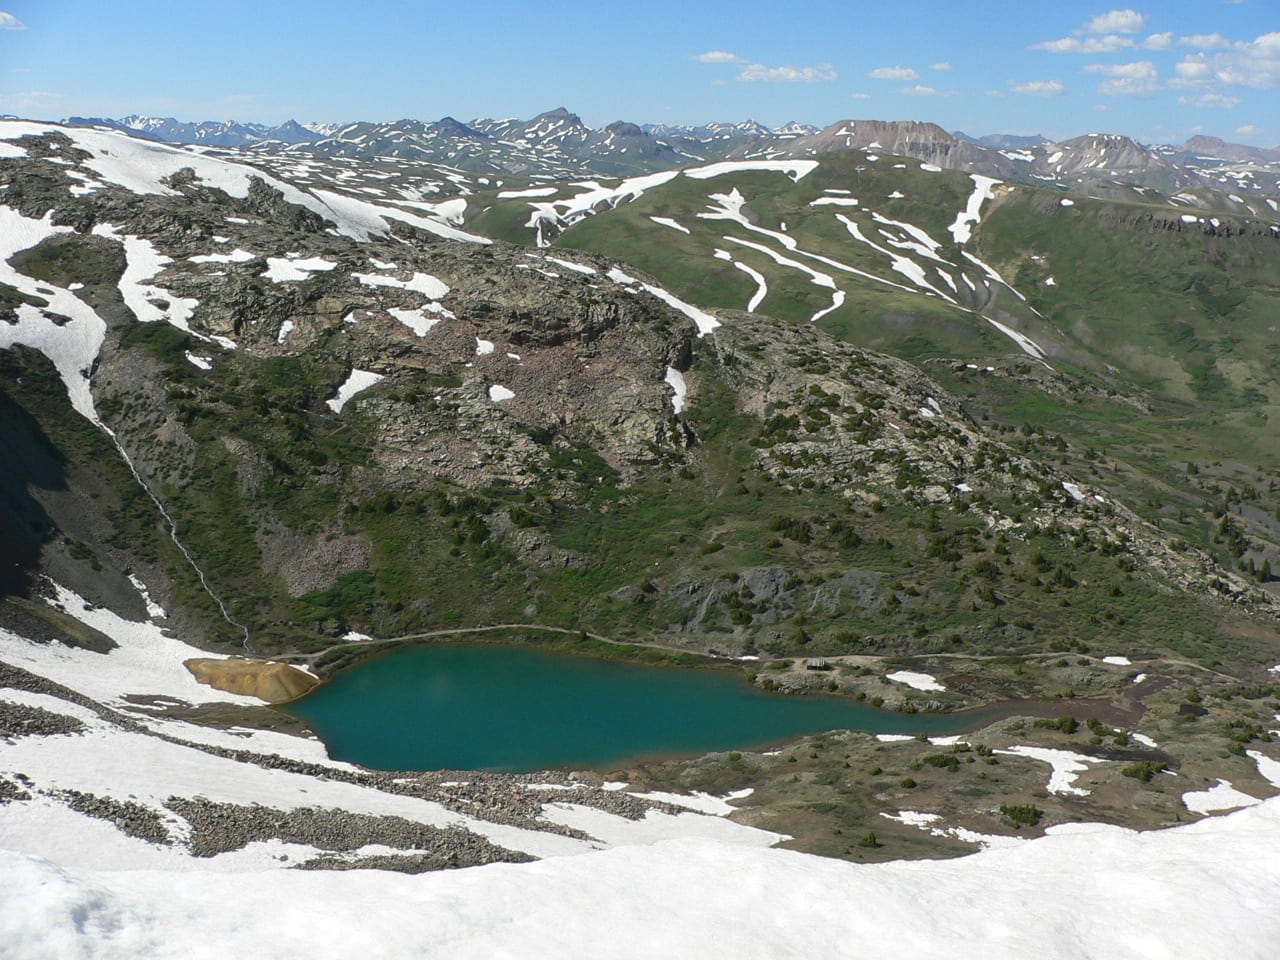 Kite Lake Alma CO Aerial View in June